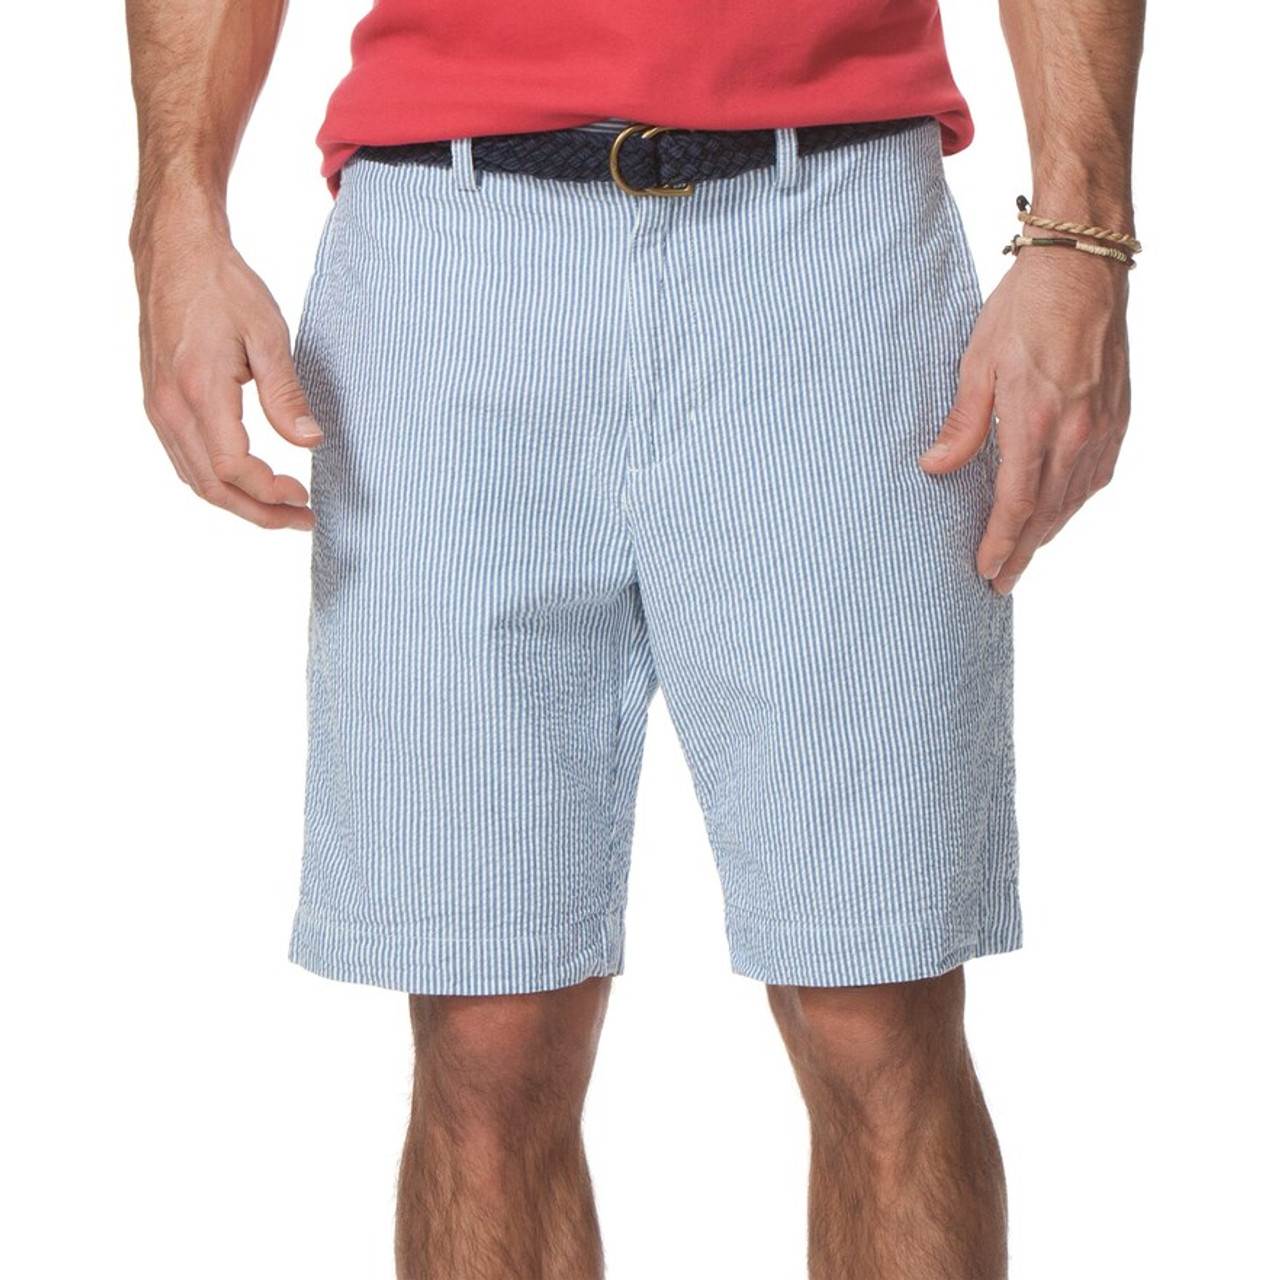 Chaps Striped Seersucker Shorts Men